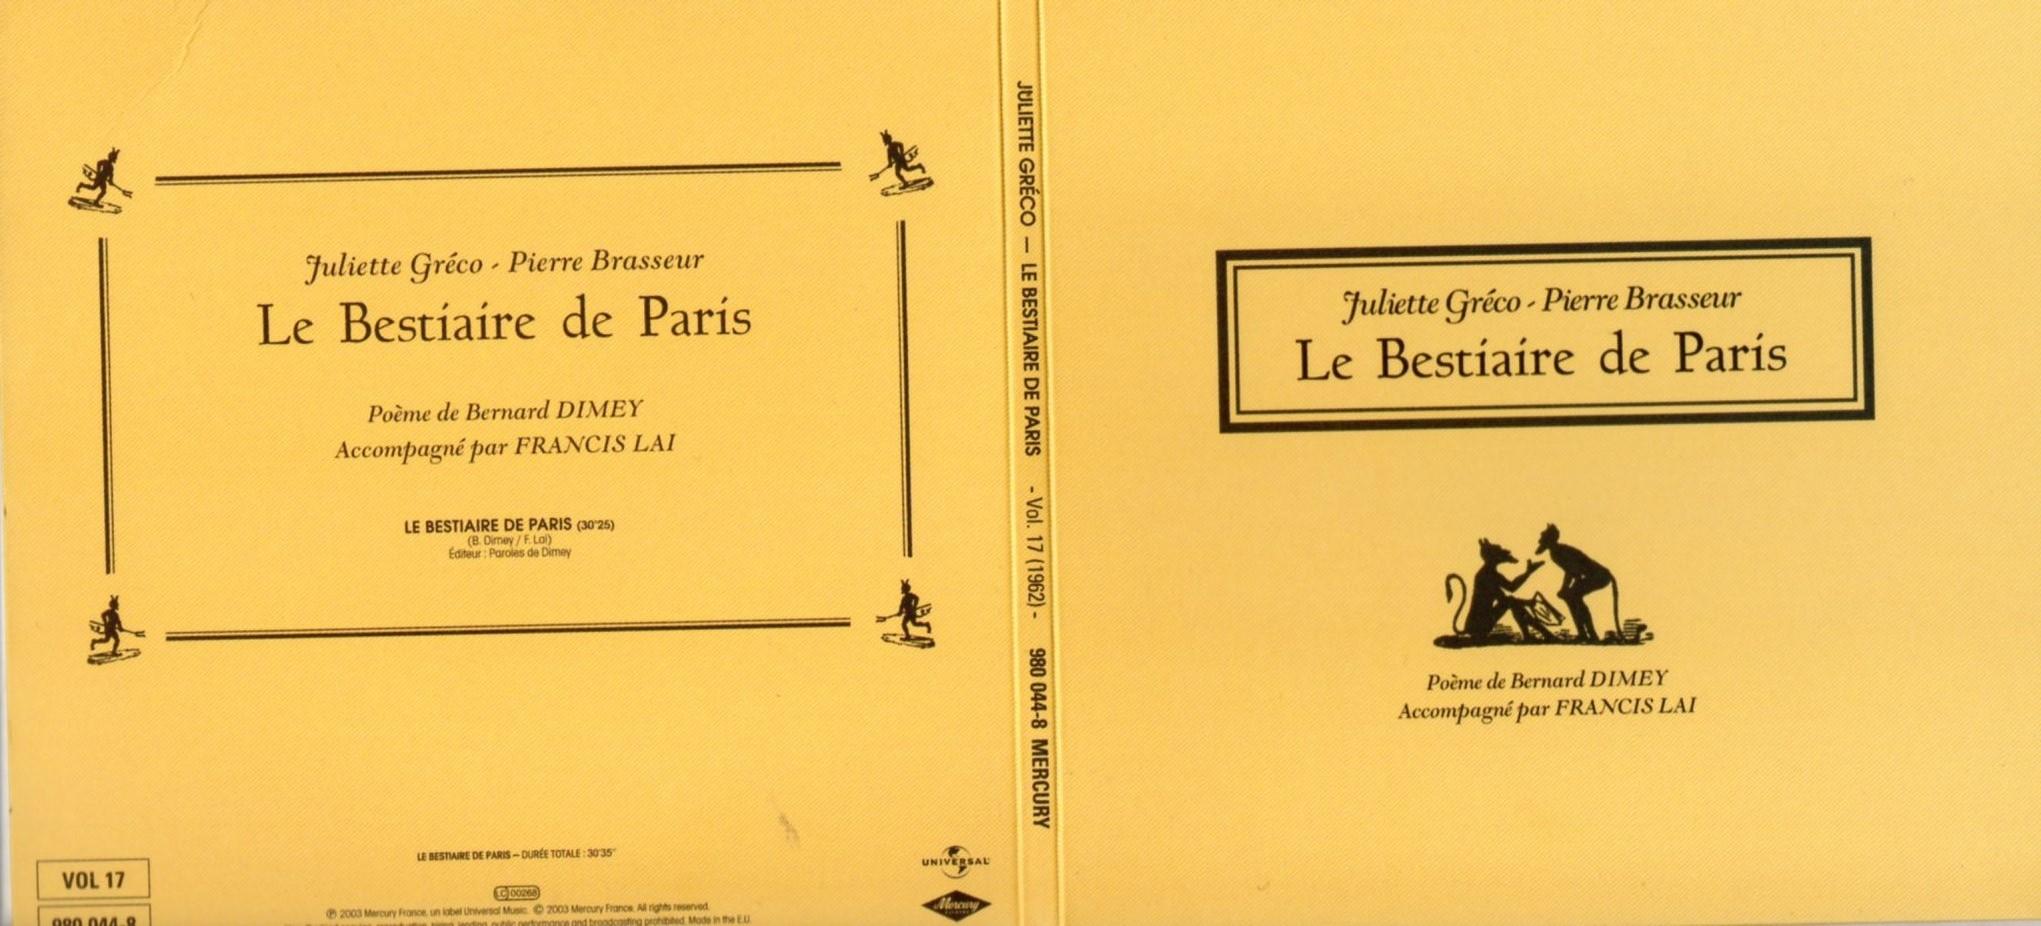 JULIETTE GRÉCO - PIERRE BRASSEUR - FRANCIS LAI - B - Le bestiare de Paris (1962) Gatefold Card board sleeve - CD